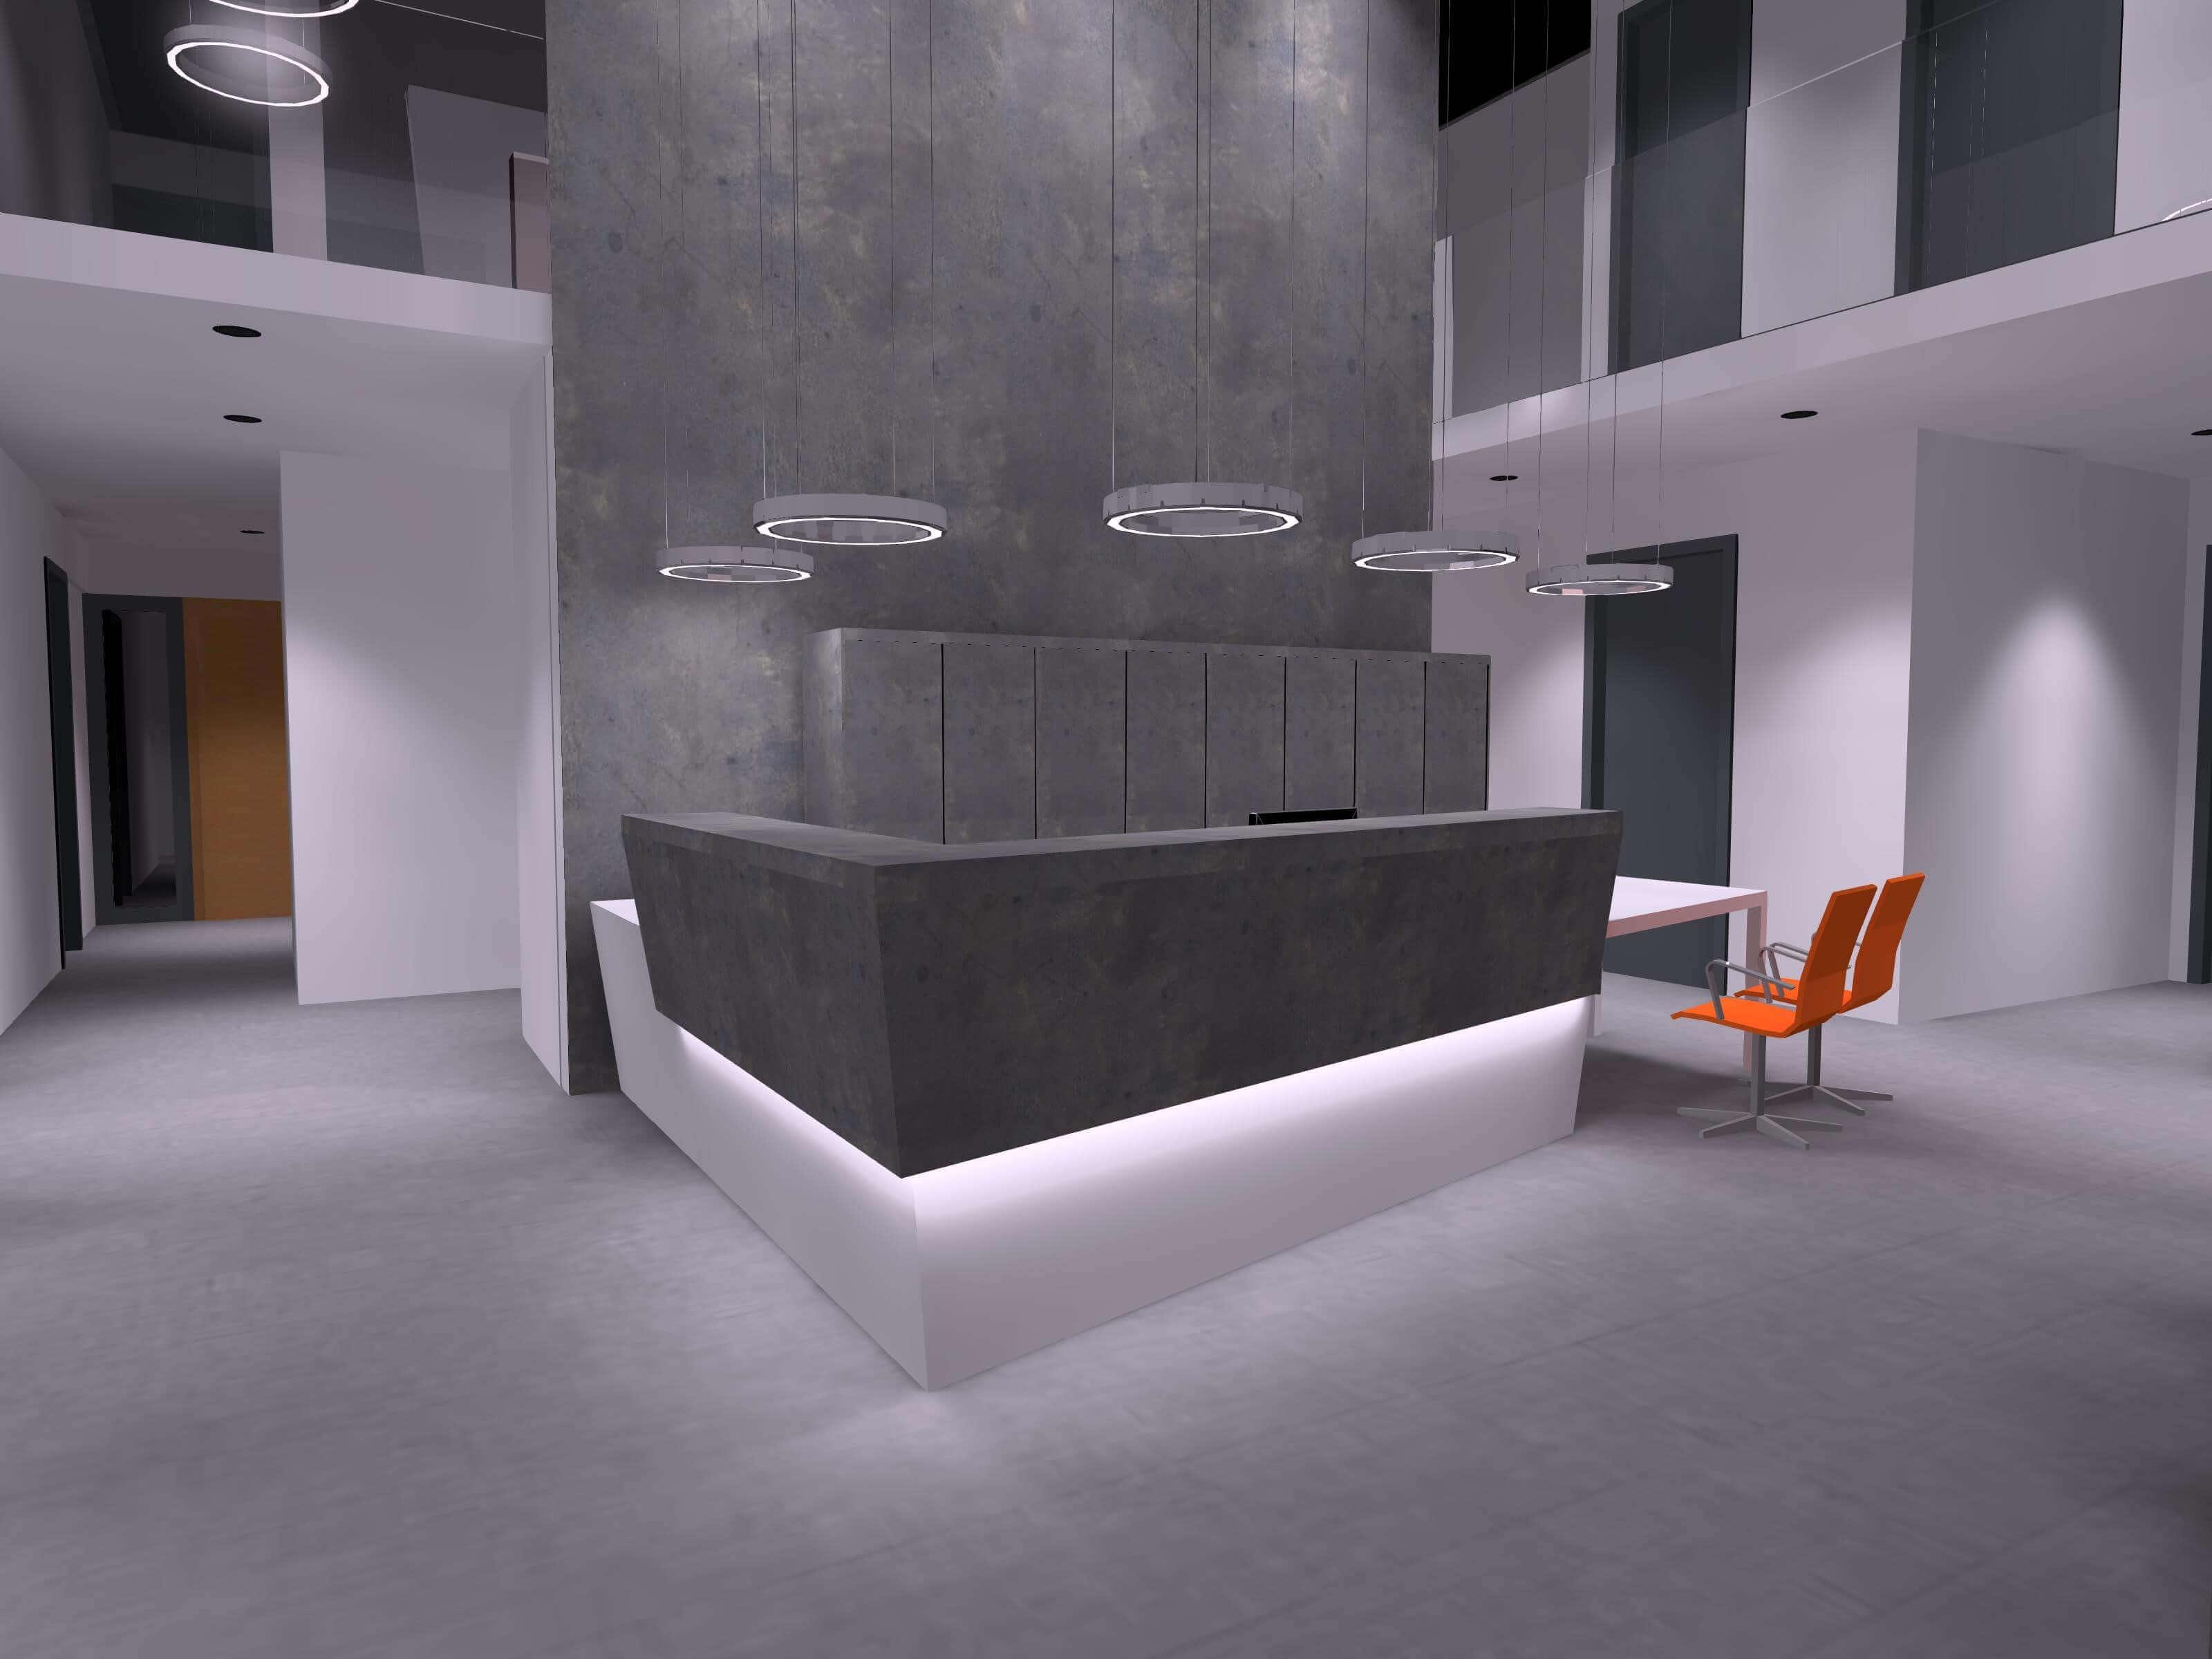 Lichtplanung 3D-Visualisierung | Leuchten Lukassen